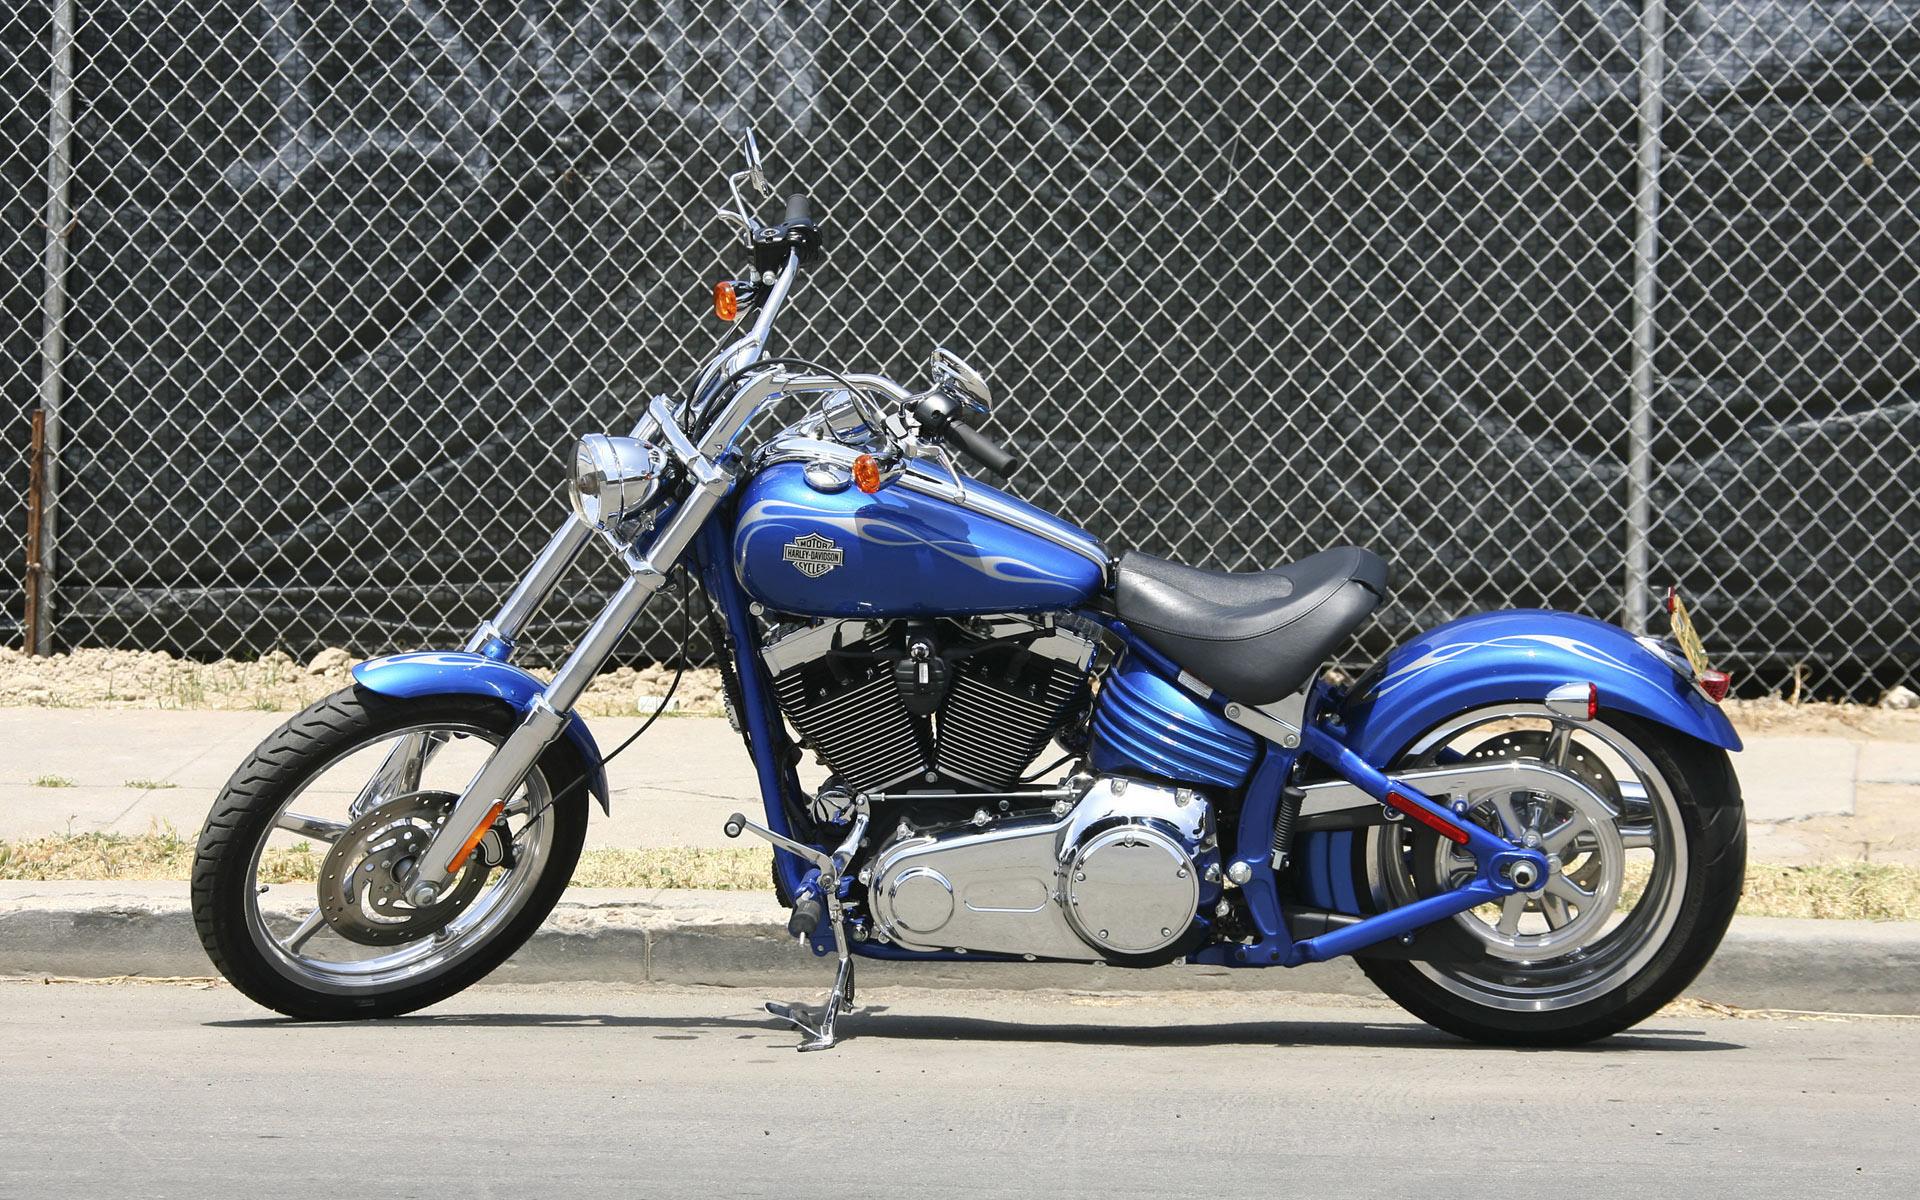 Harley Davidson HD wallpaper 1920 x 1200 pictures 15jpg Harley 39jpg 1920x1200